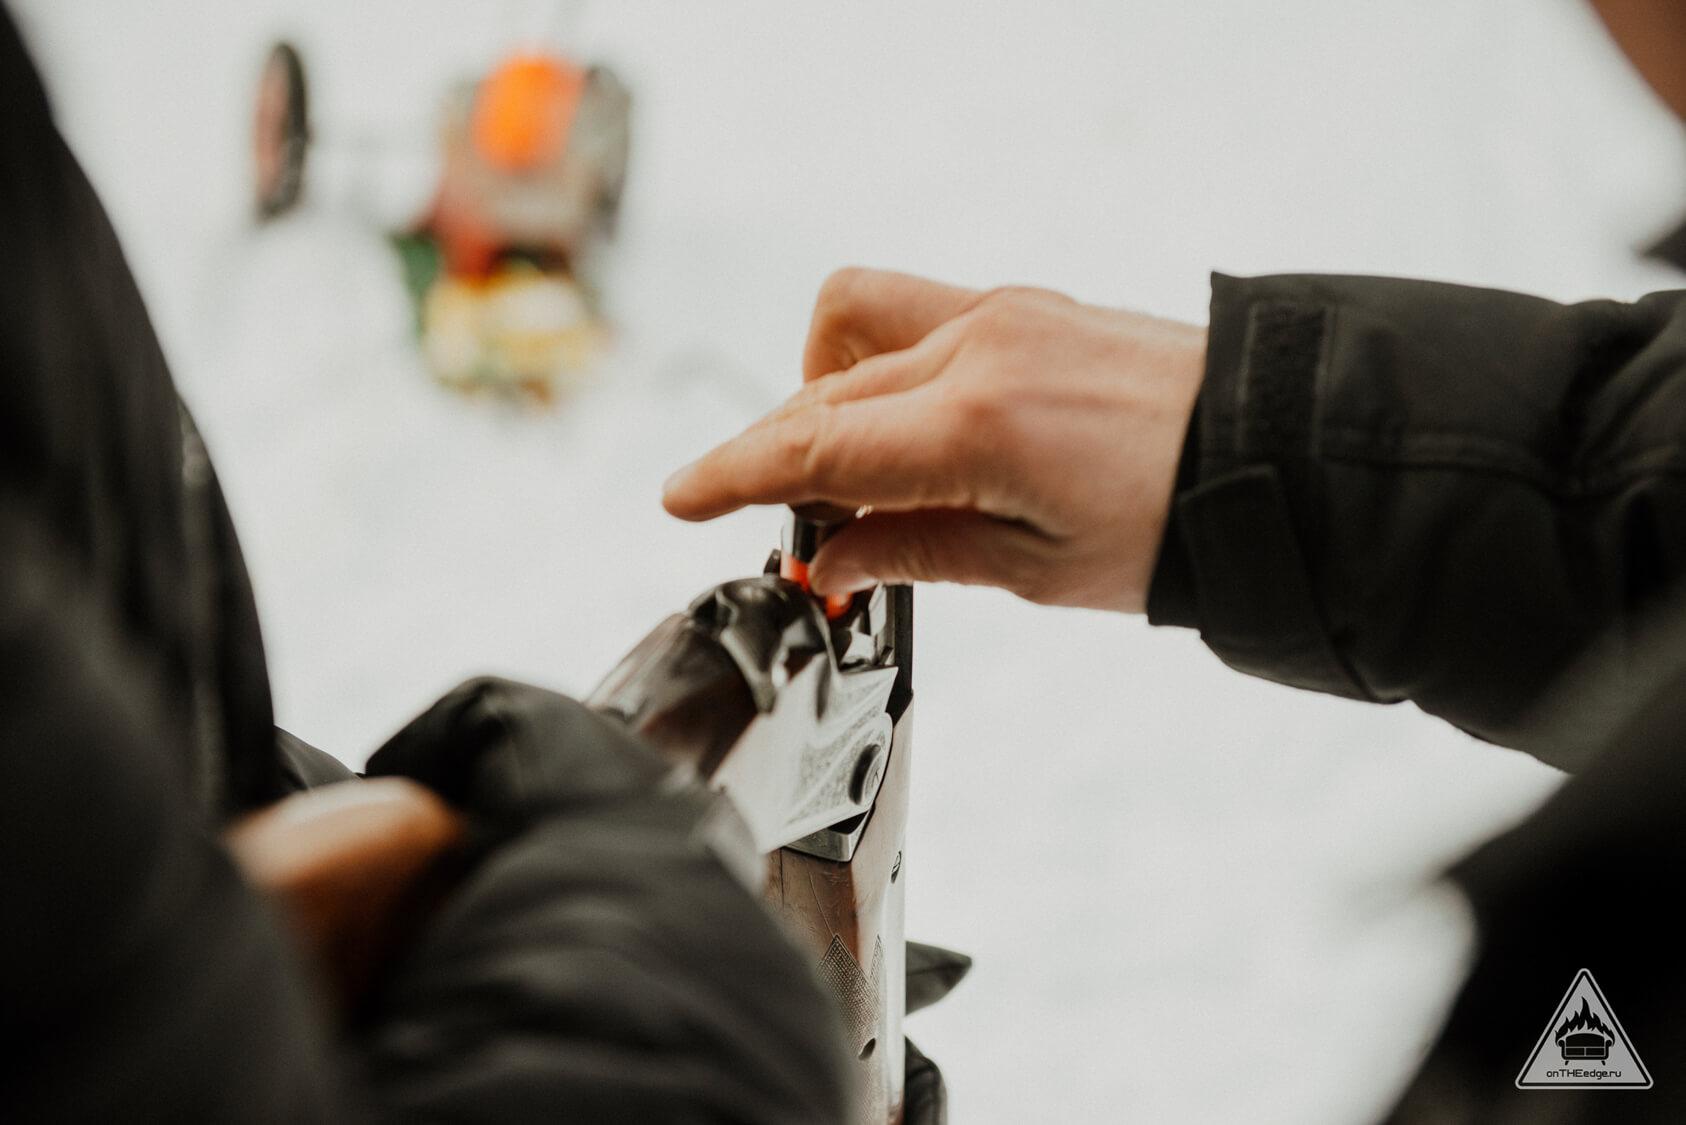 заряжаем ружье